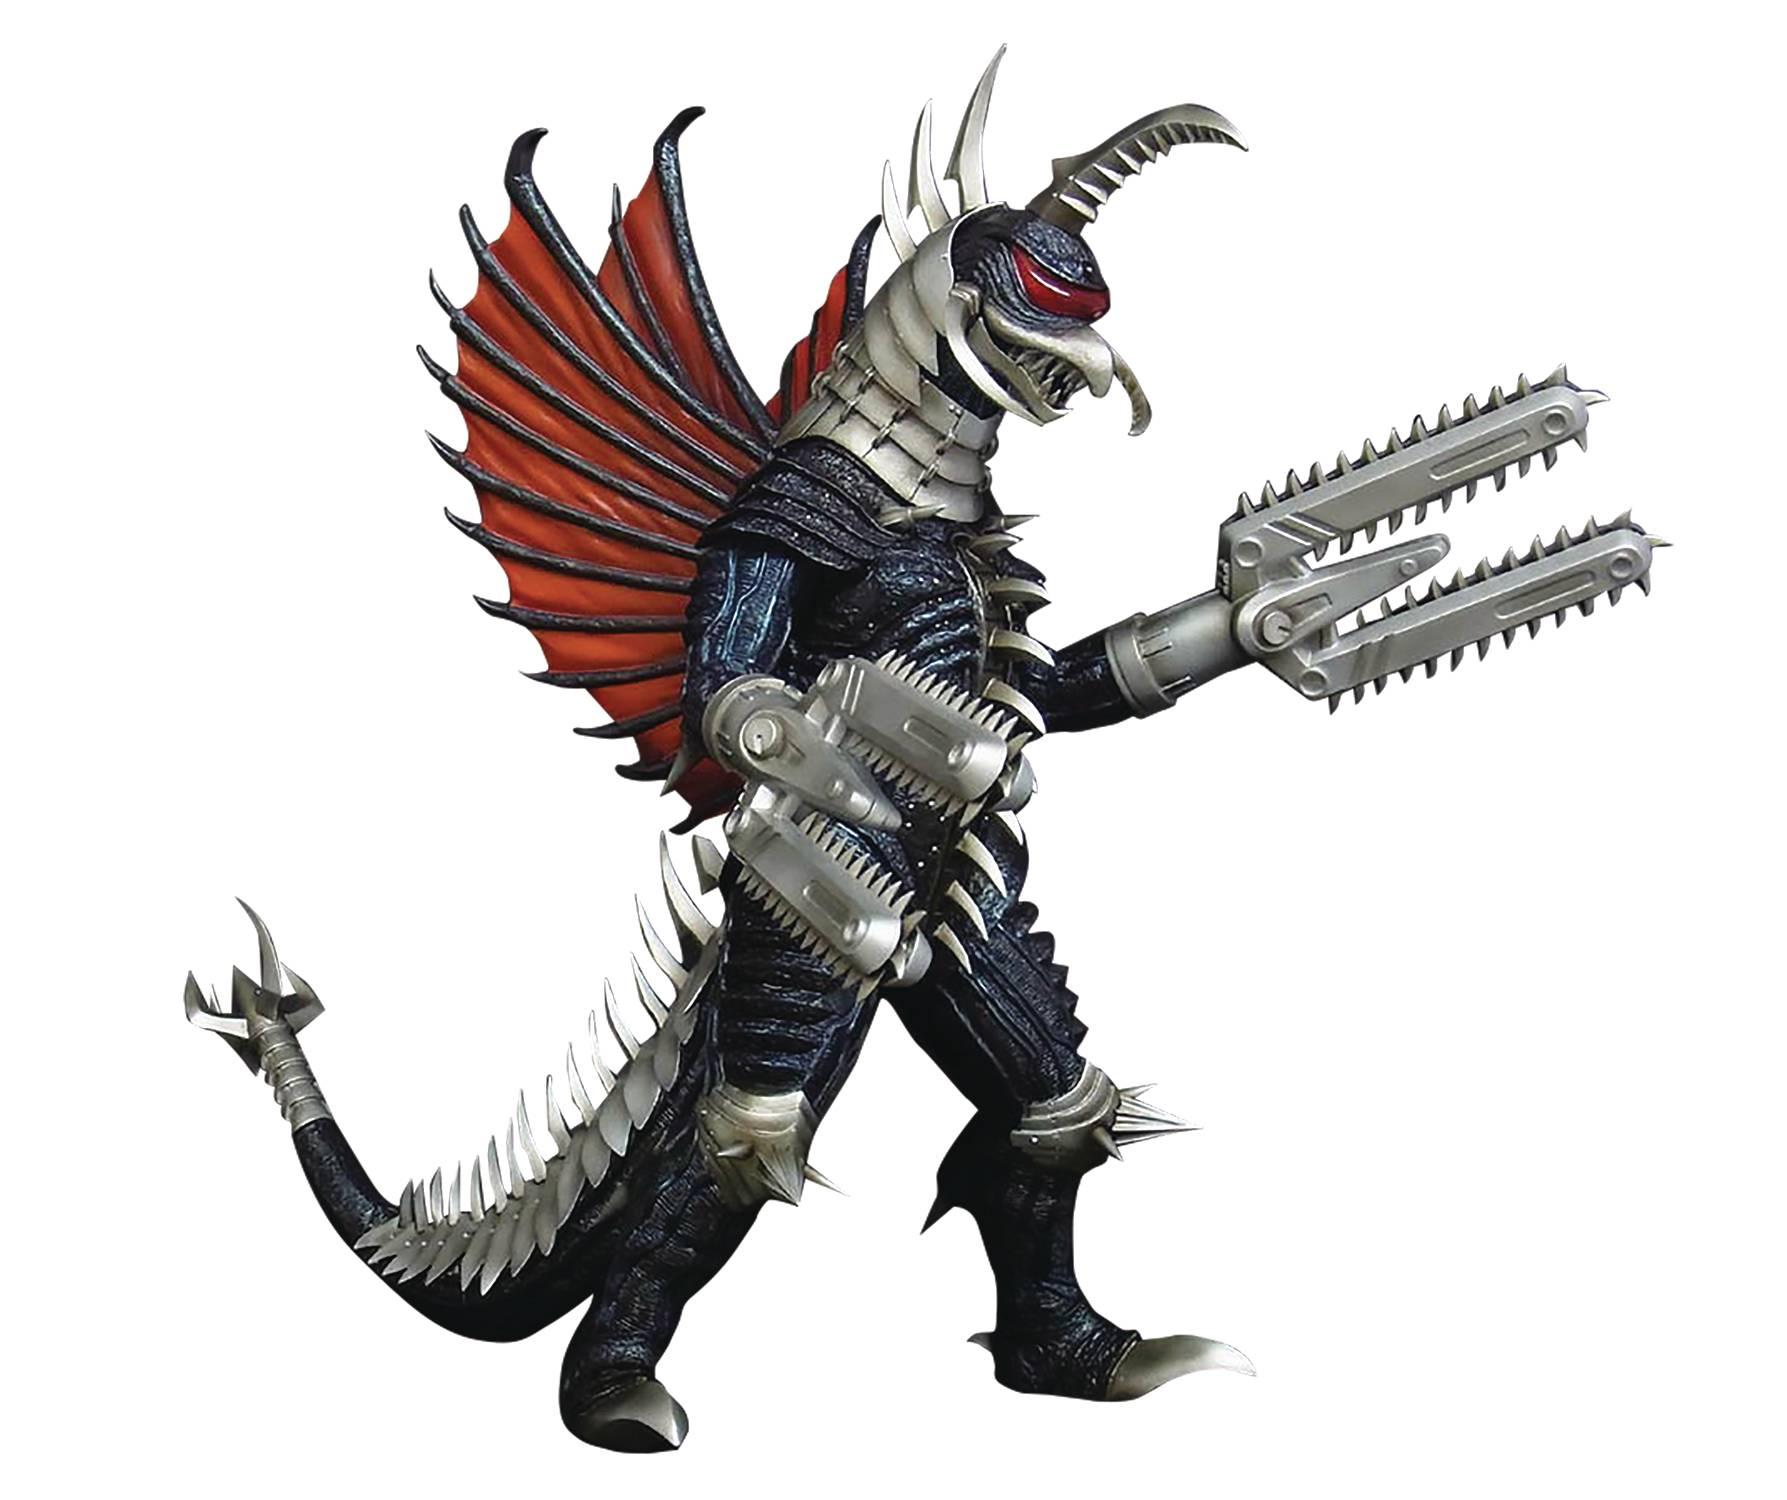 Godzilla Kaiju final wars. Mecha Godzilla 2004